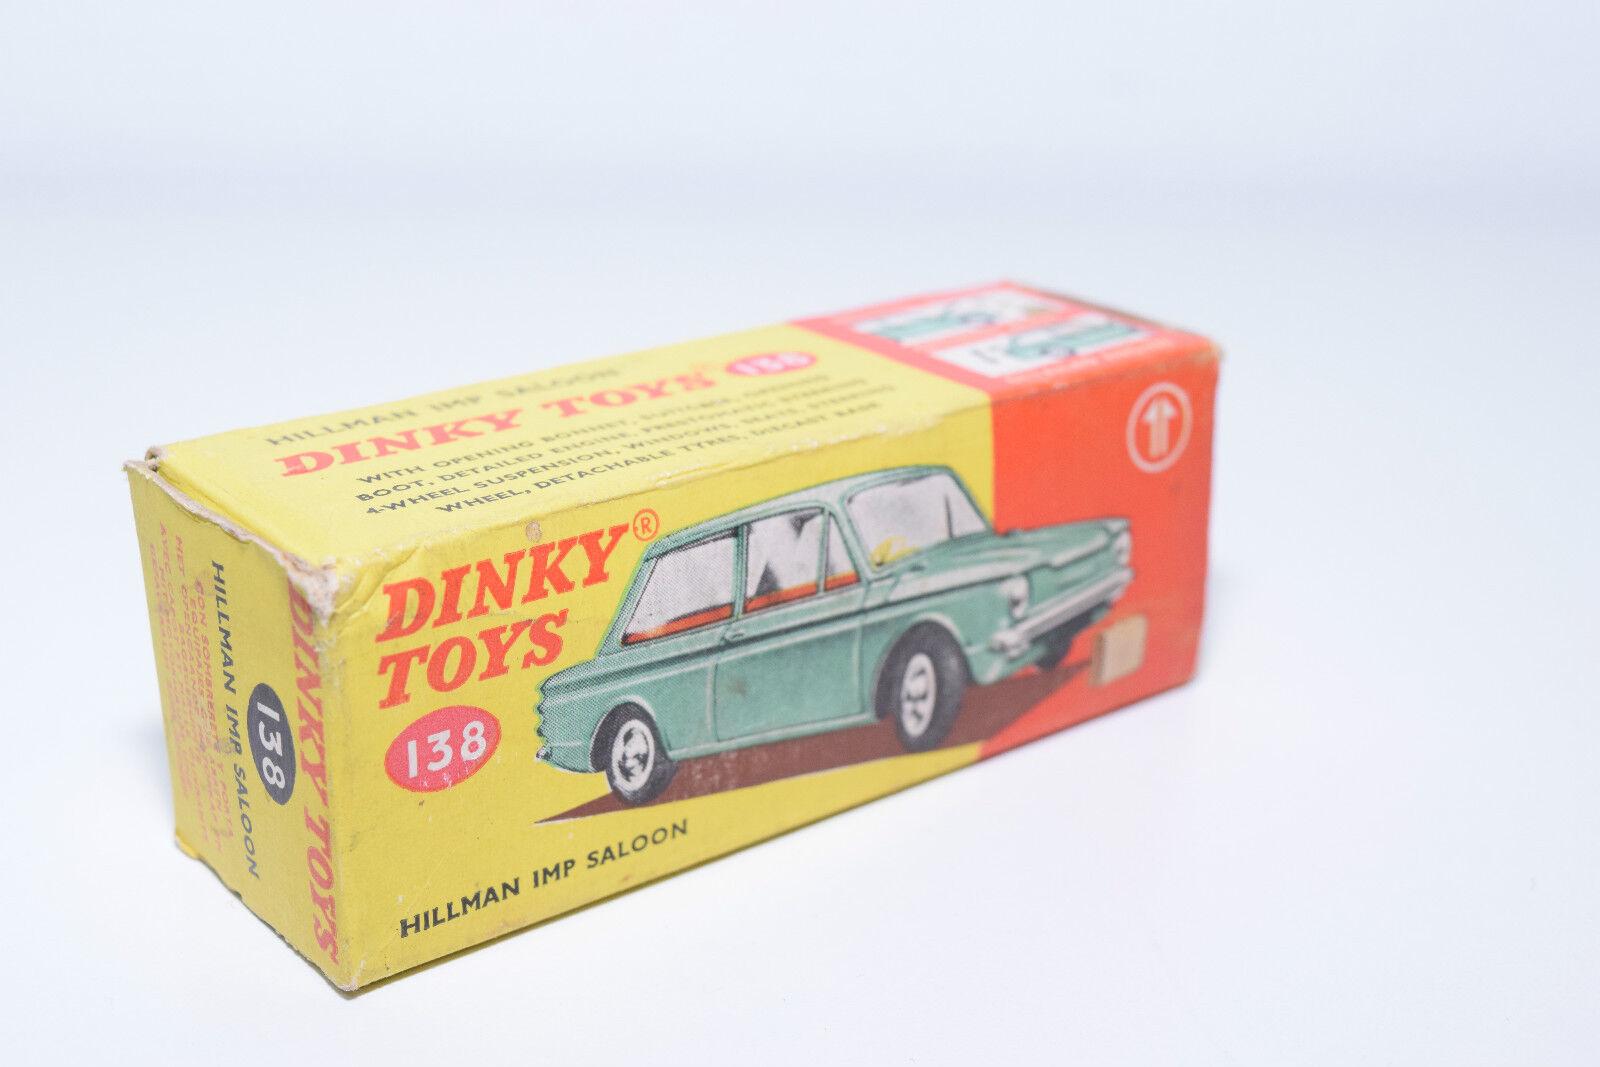 DINKY TOYS 138 HILLMAN IMP SALOON ORIGINAL EMPTY BOX EXCELLENT